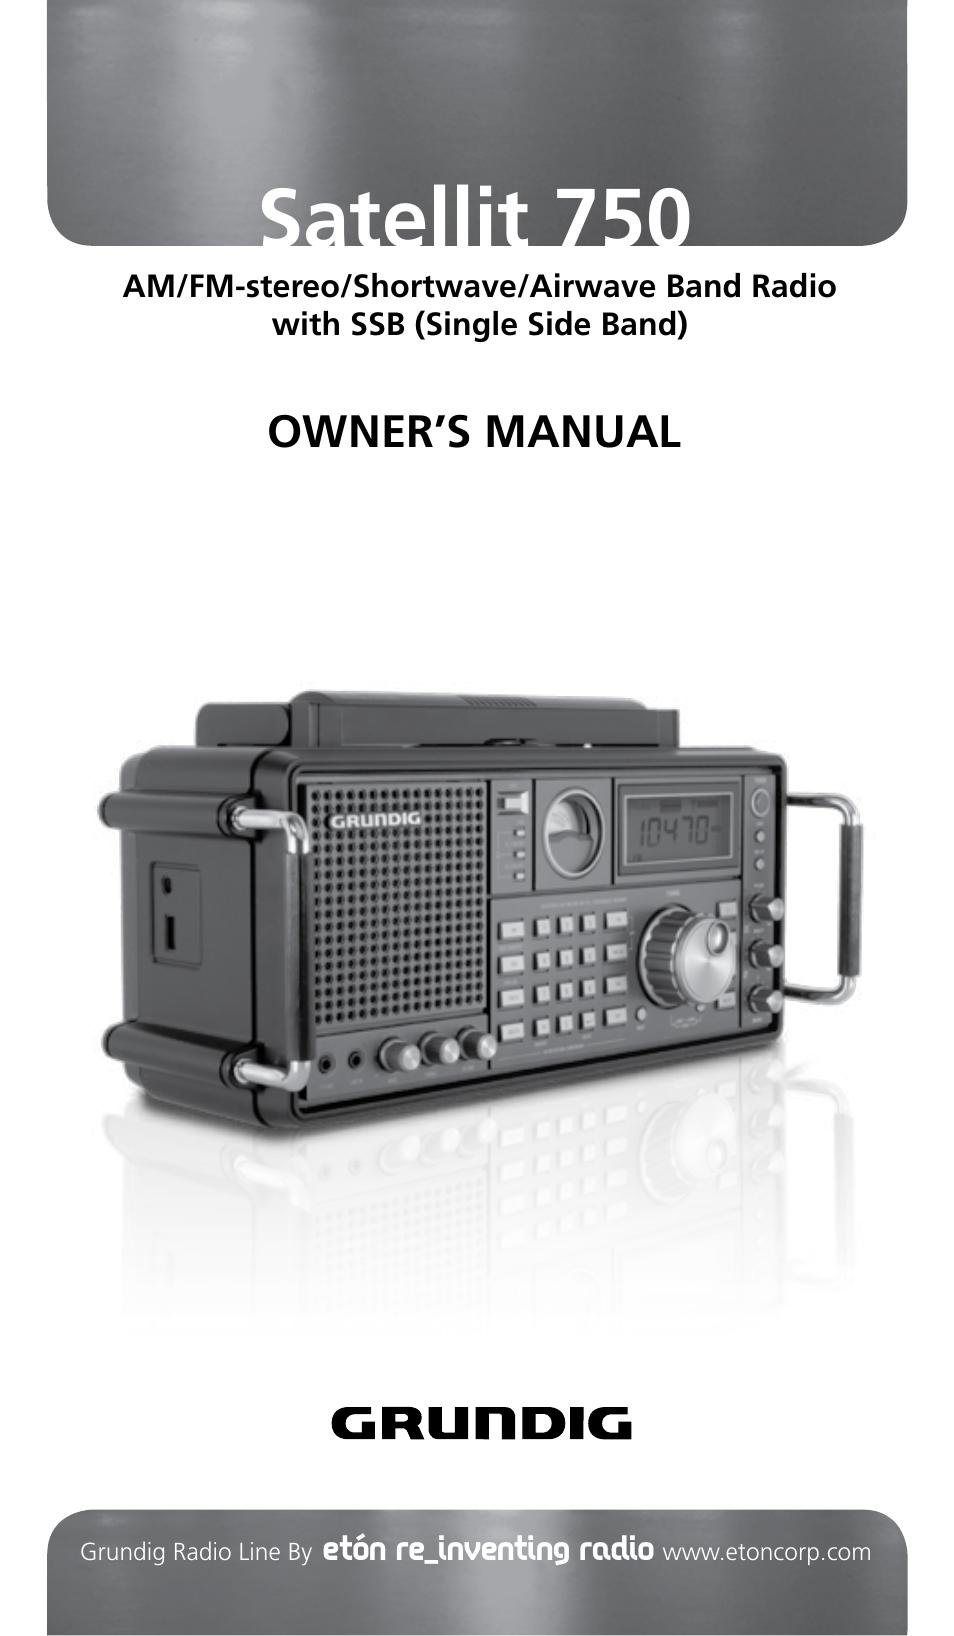 eton grundig edition satellit manual